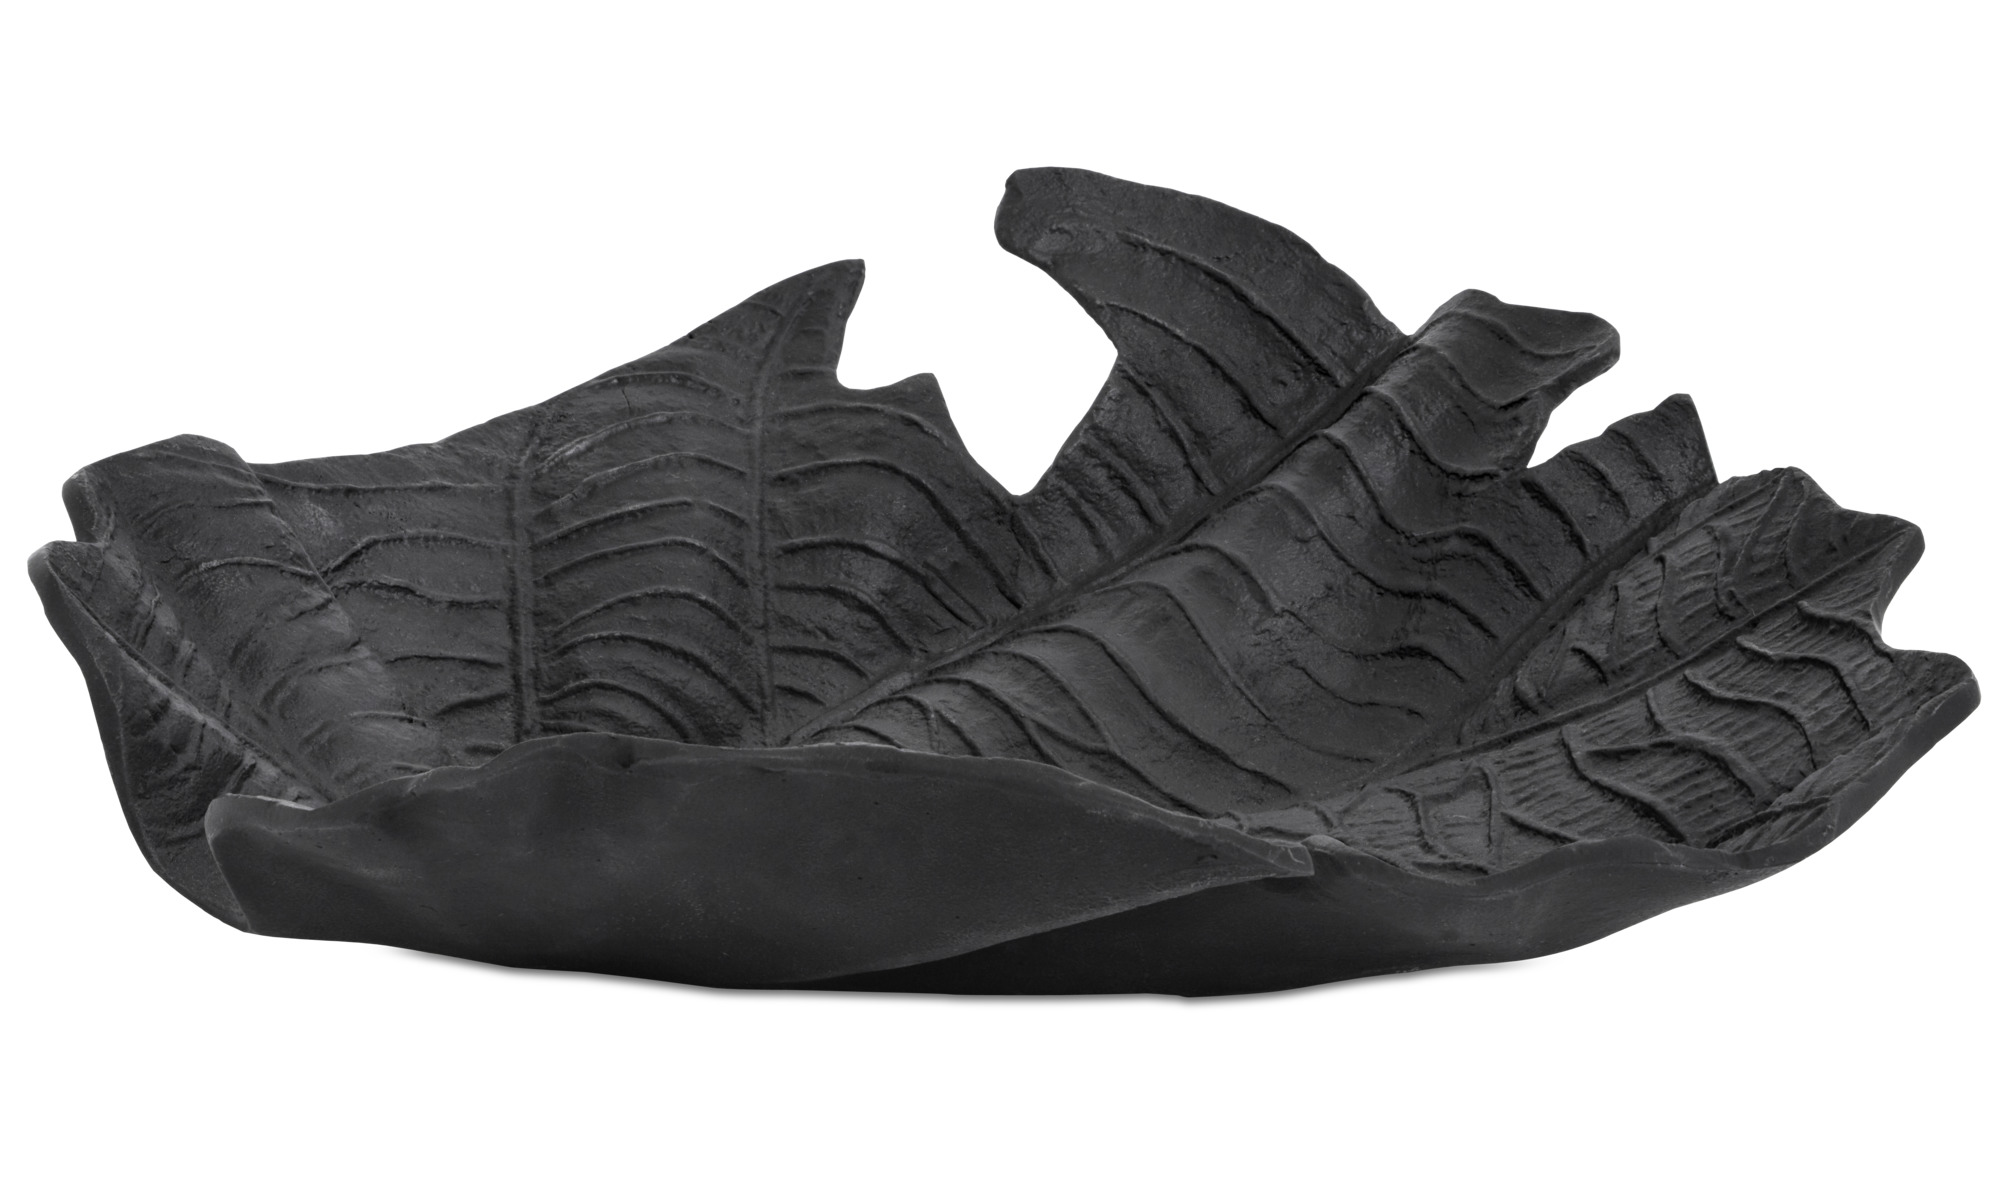 Dekoracja - Rzeźba Velvet leaf - Czarny - Aluminium